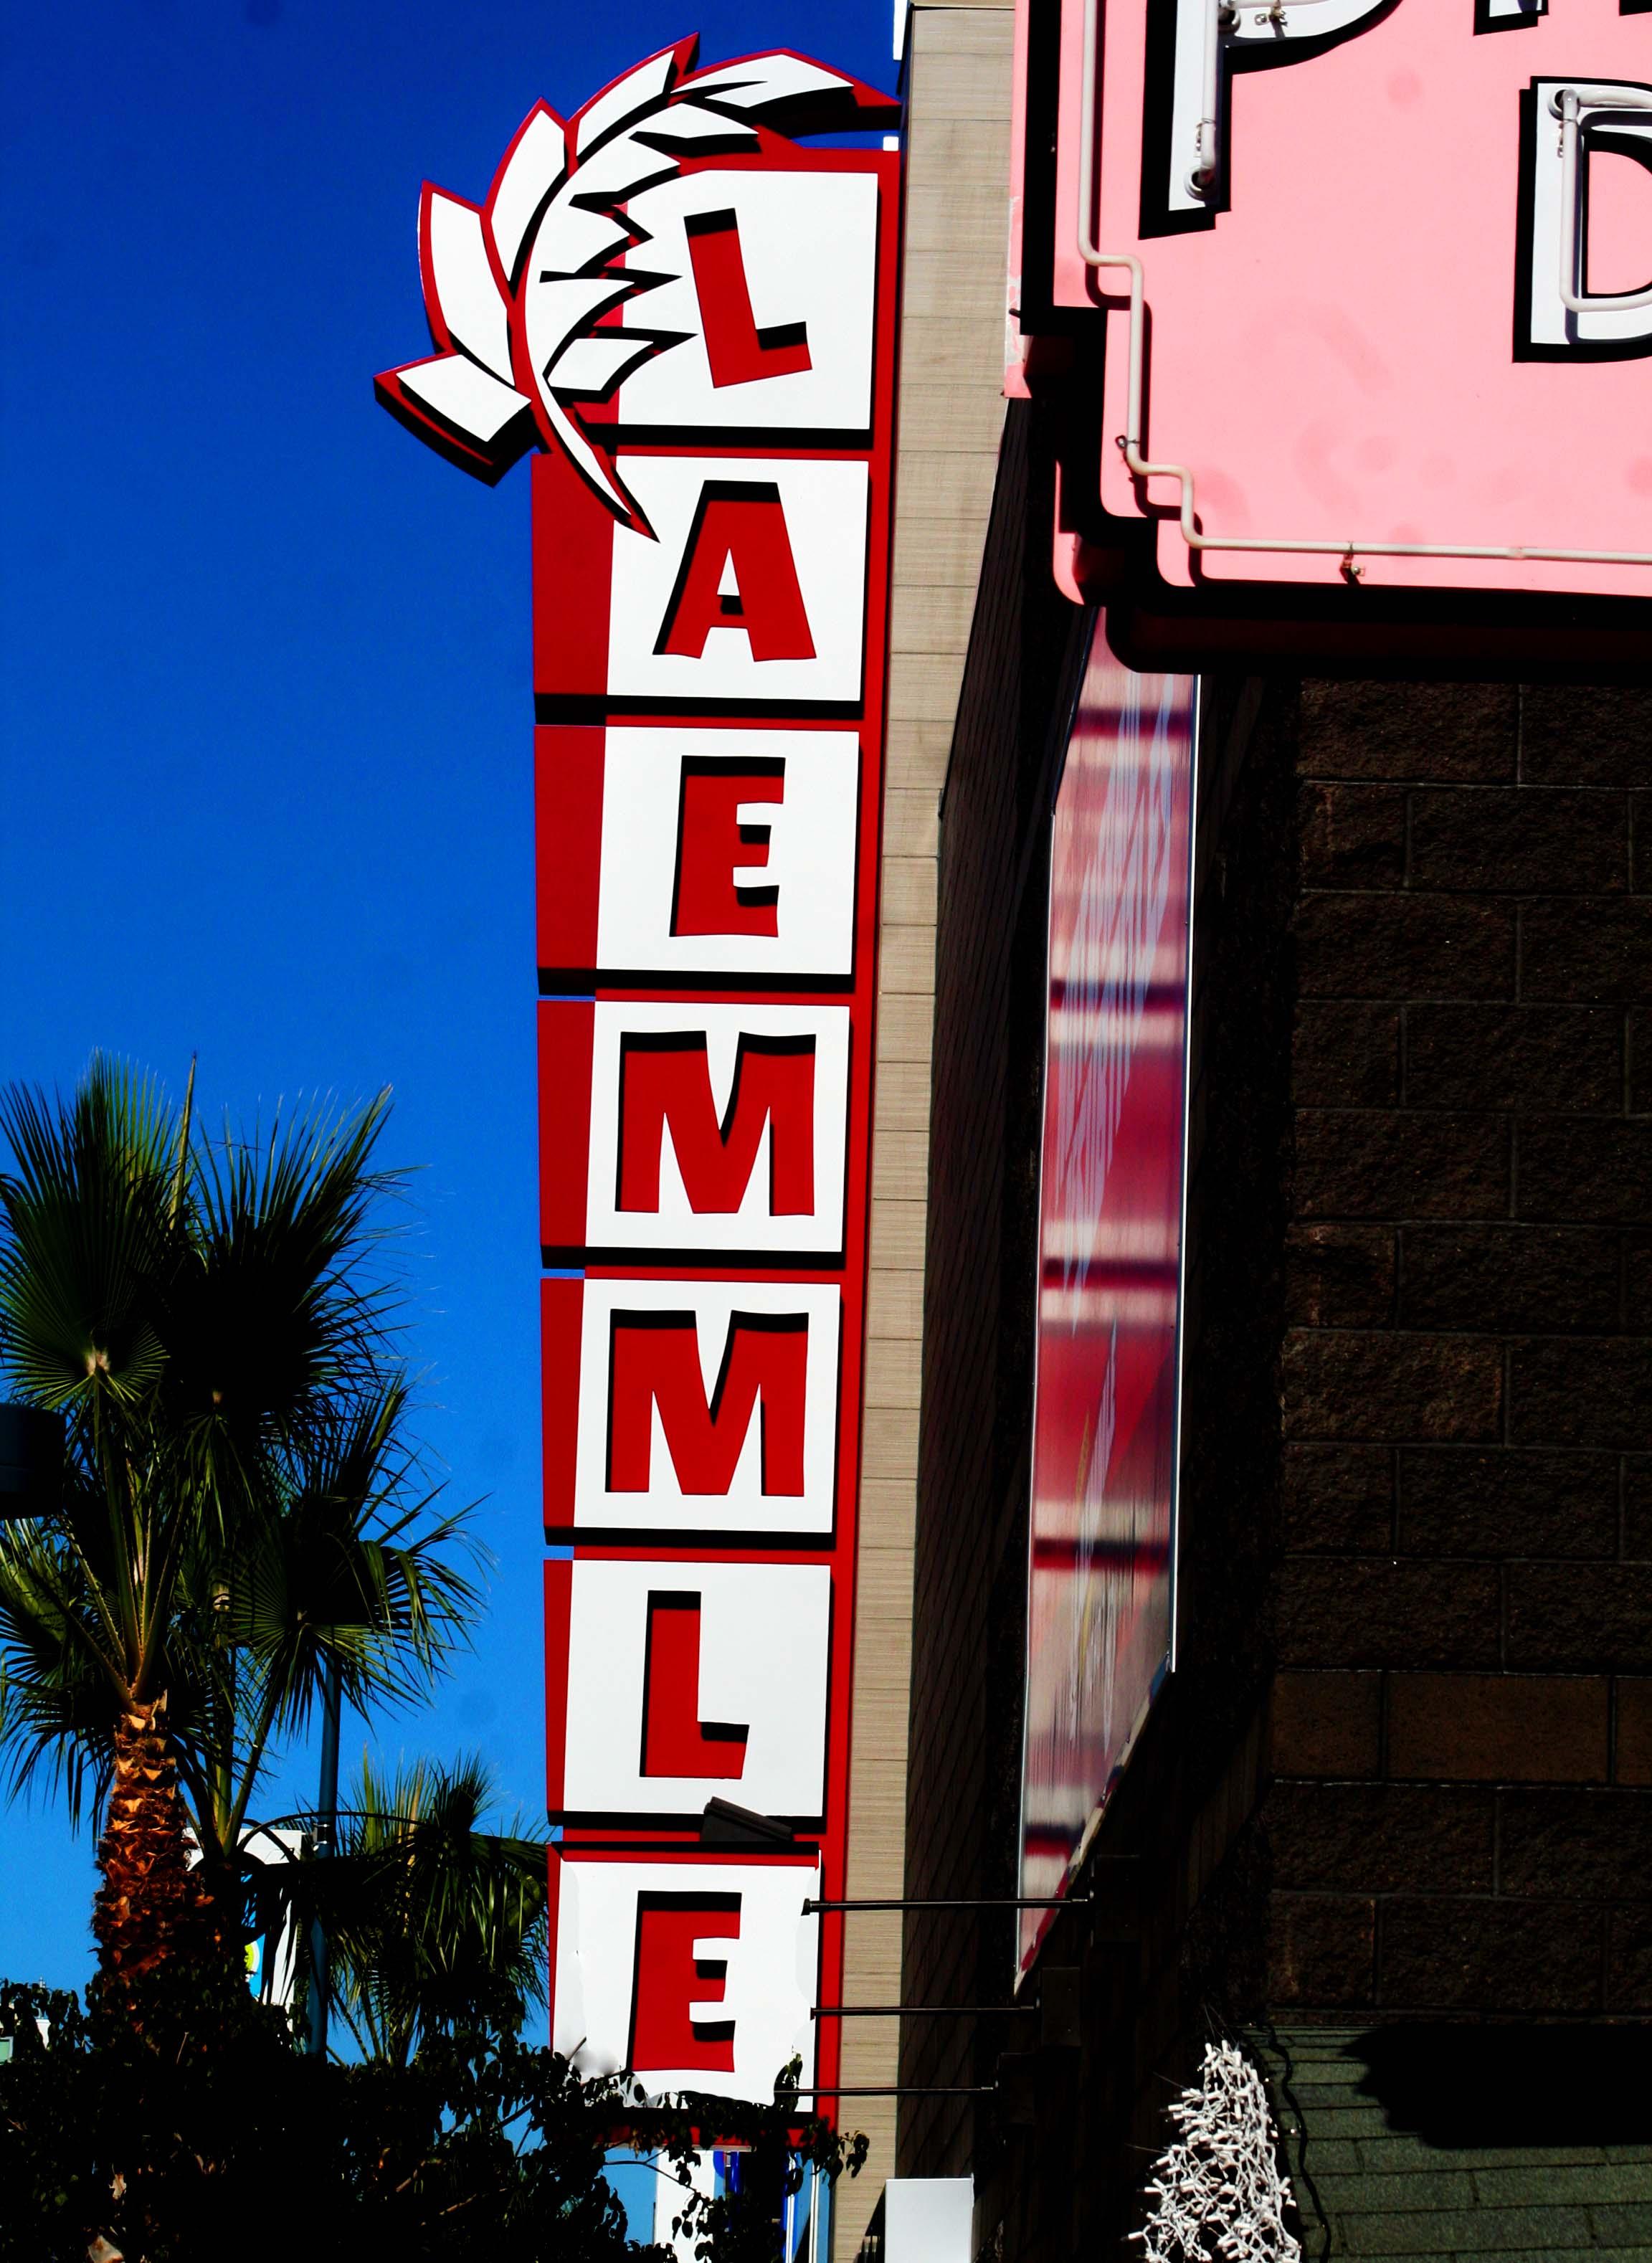 Laemmle 2 with E.jpg